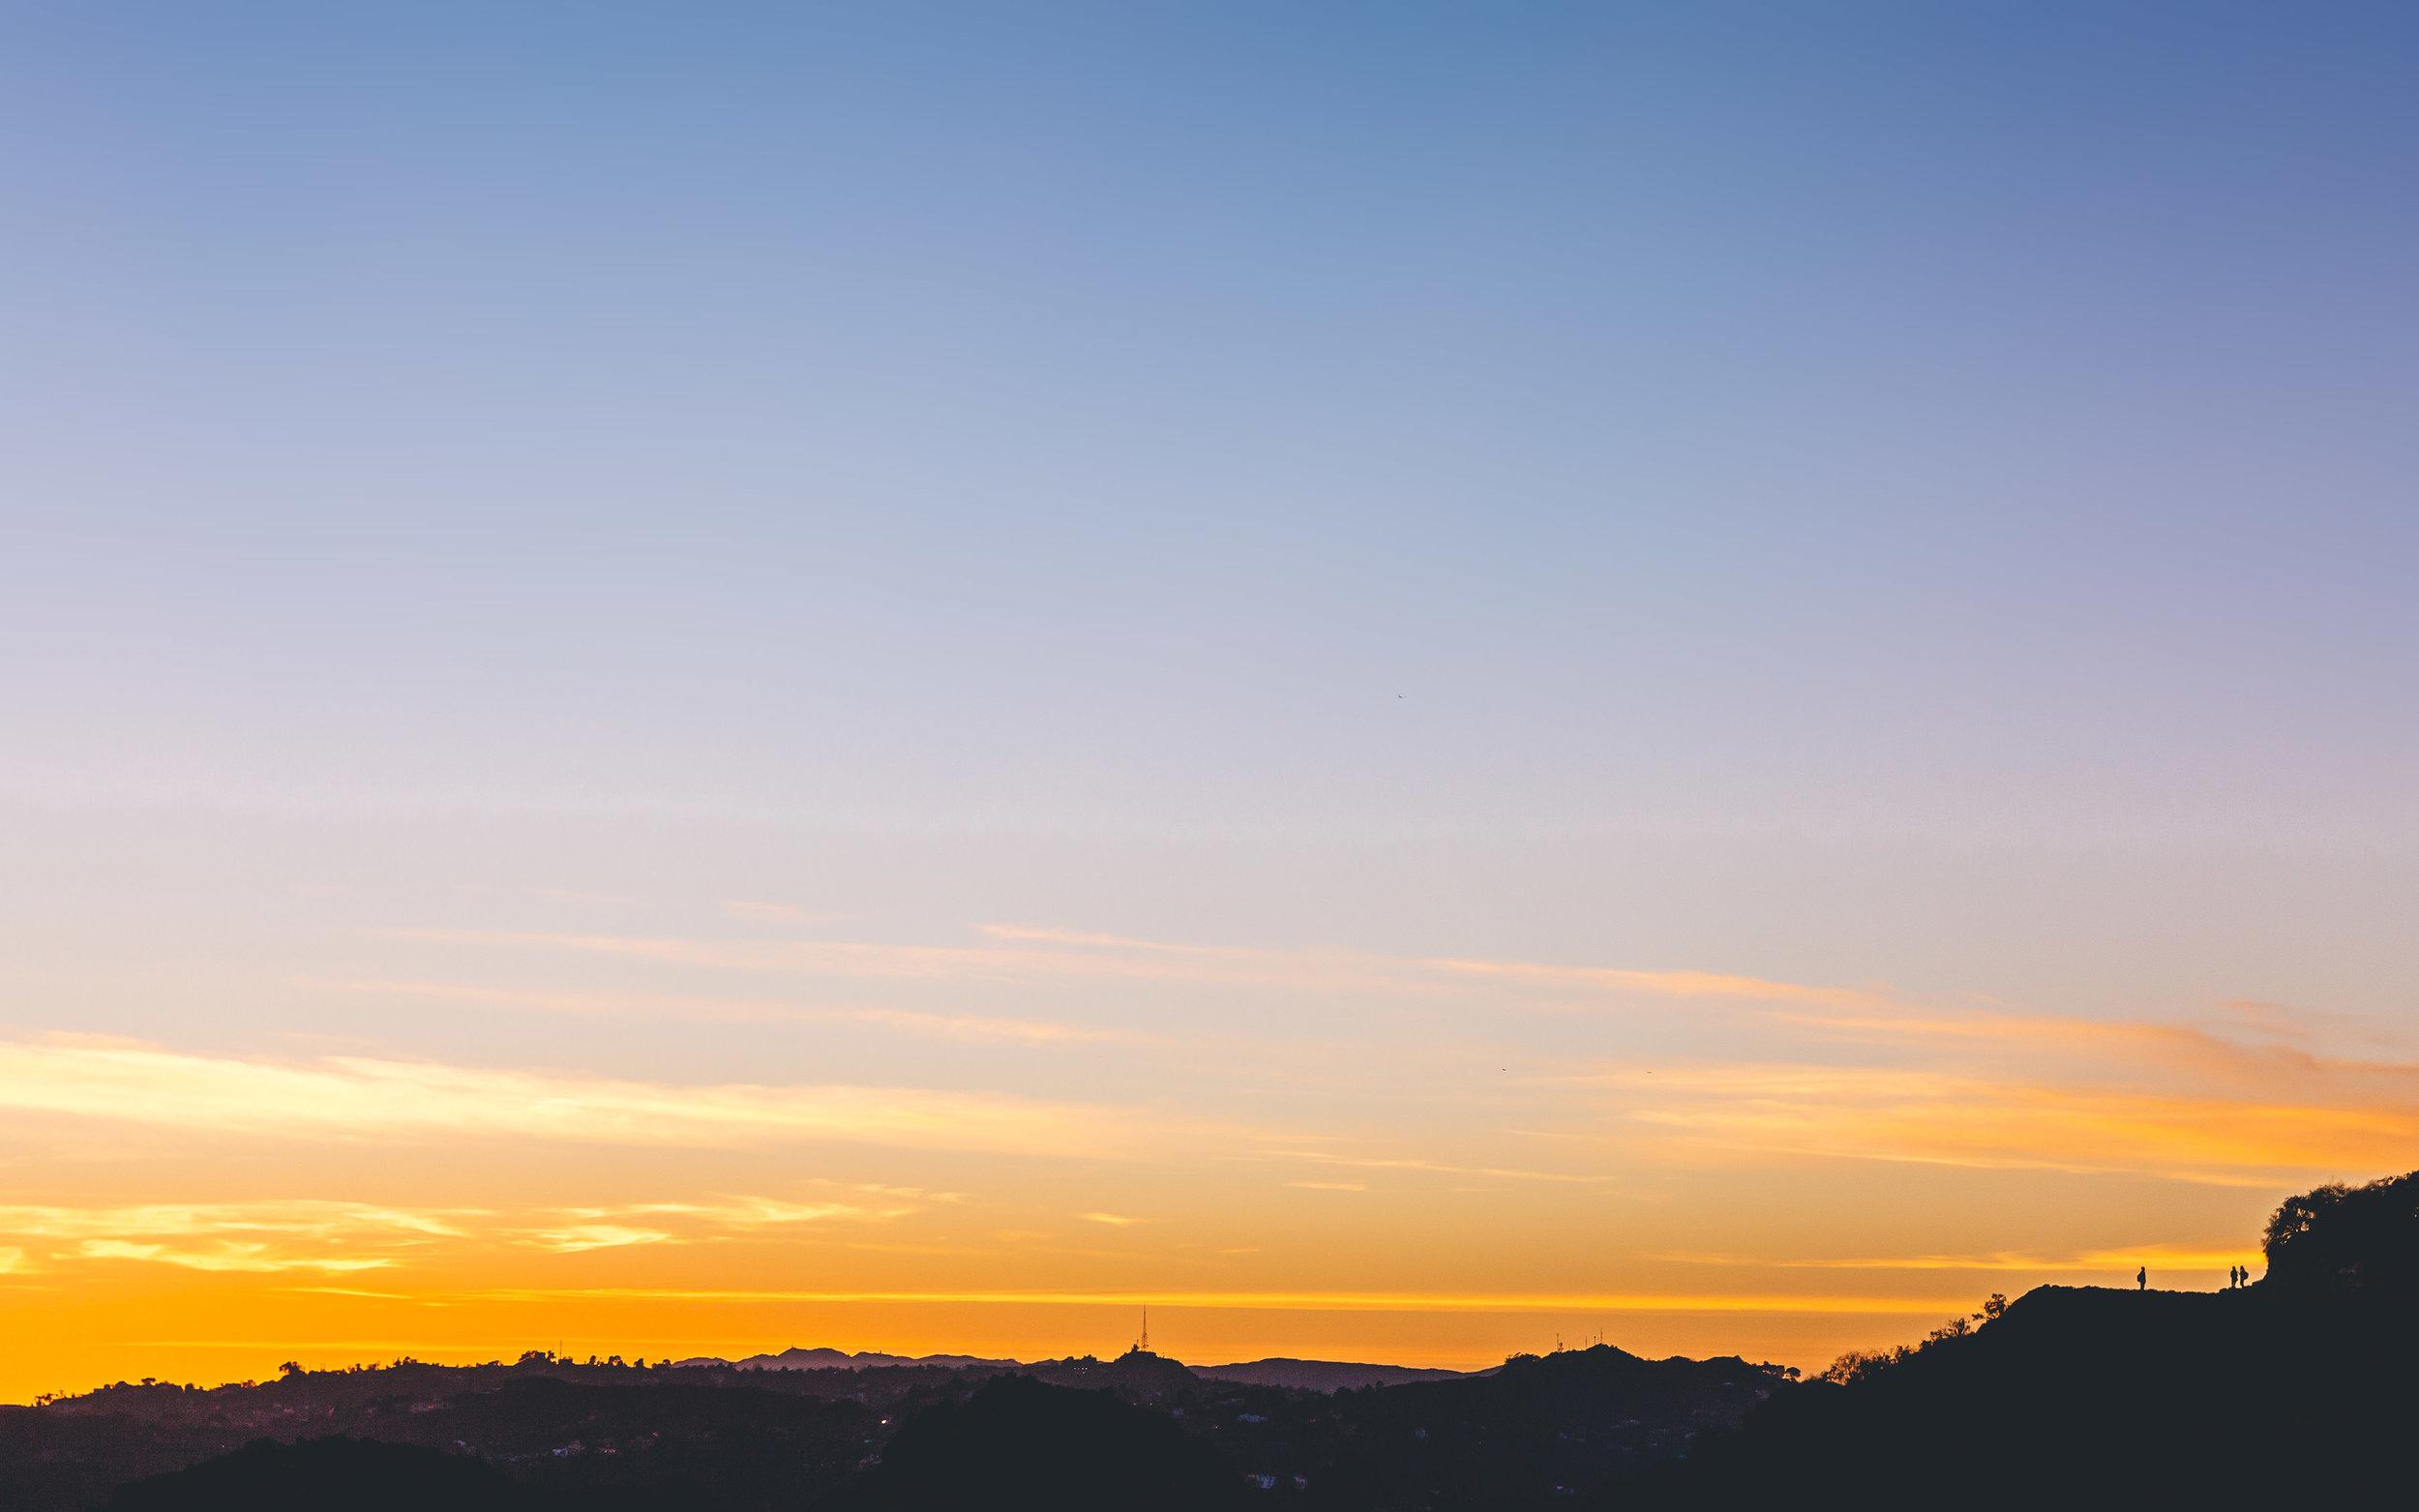 2017-GriffithPhotowalk-0010-sm.jpg